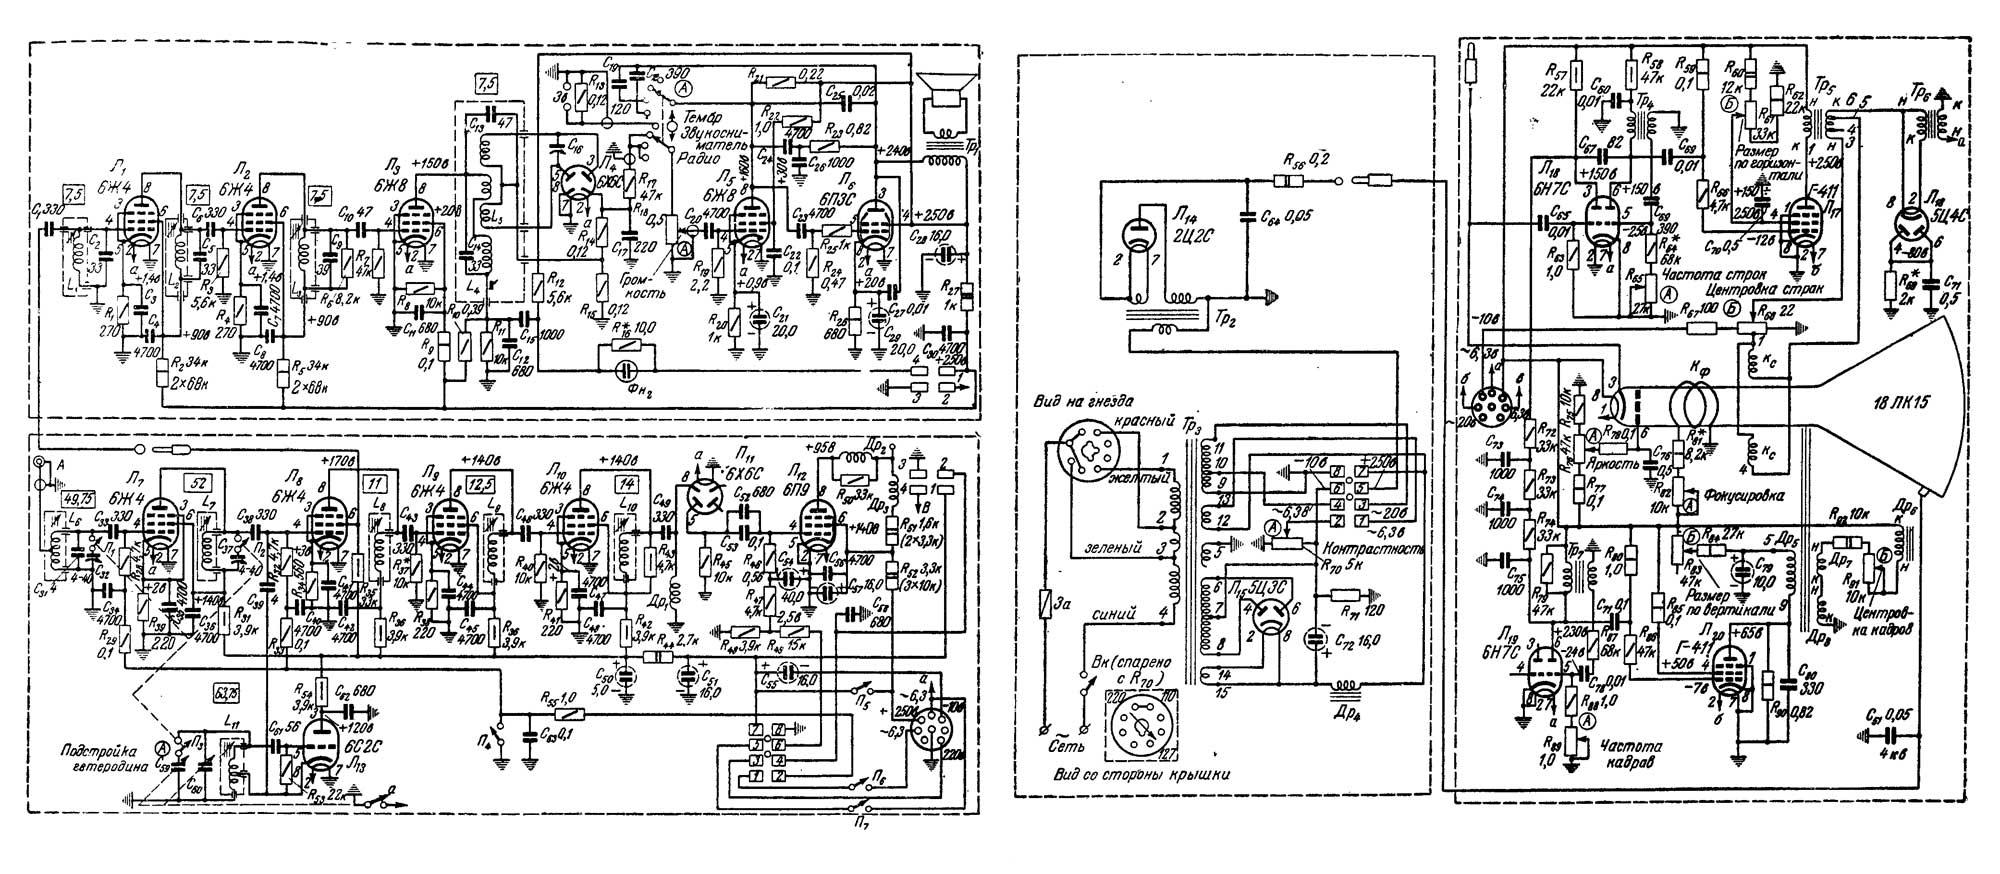 Elf Transmitter Schematic Trusted Wiring Diagrams Tv Circuit T1 Receiver Connection Diagram U2022 Am Radio